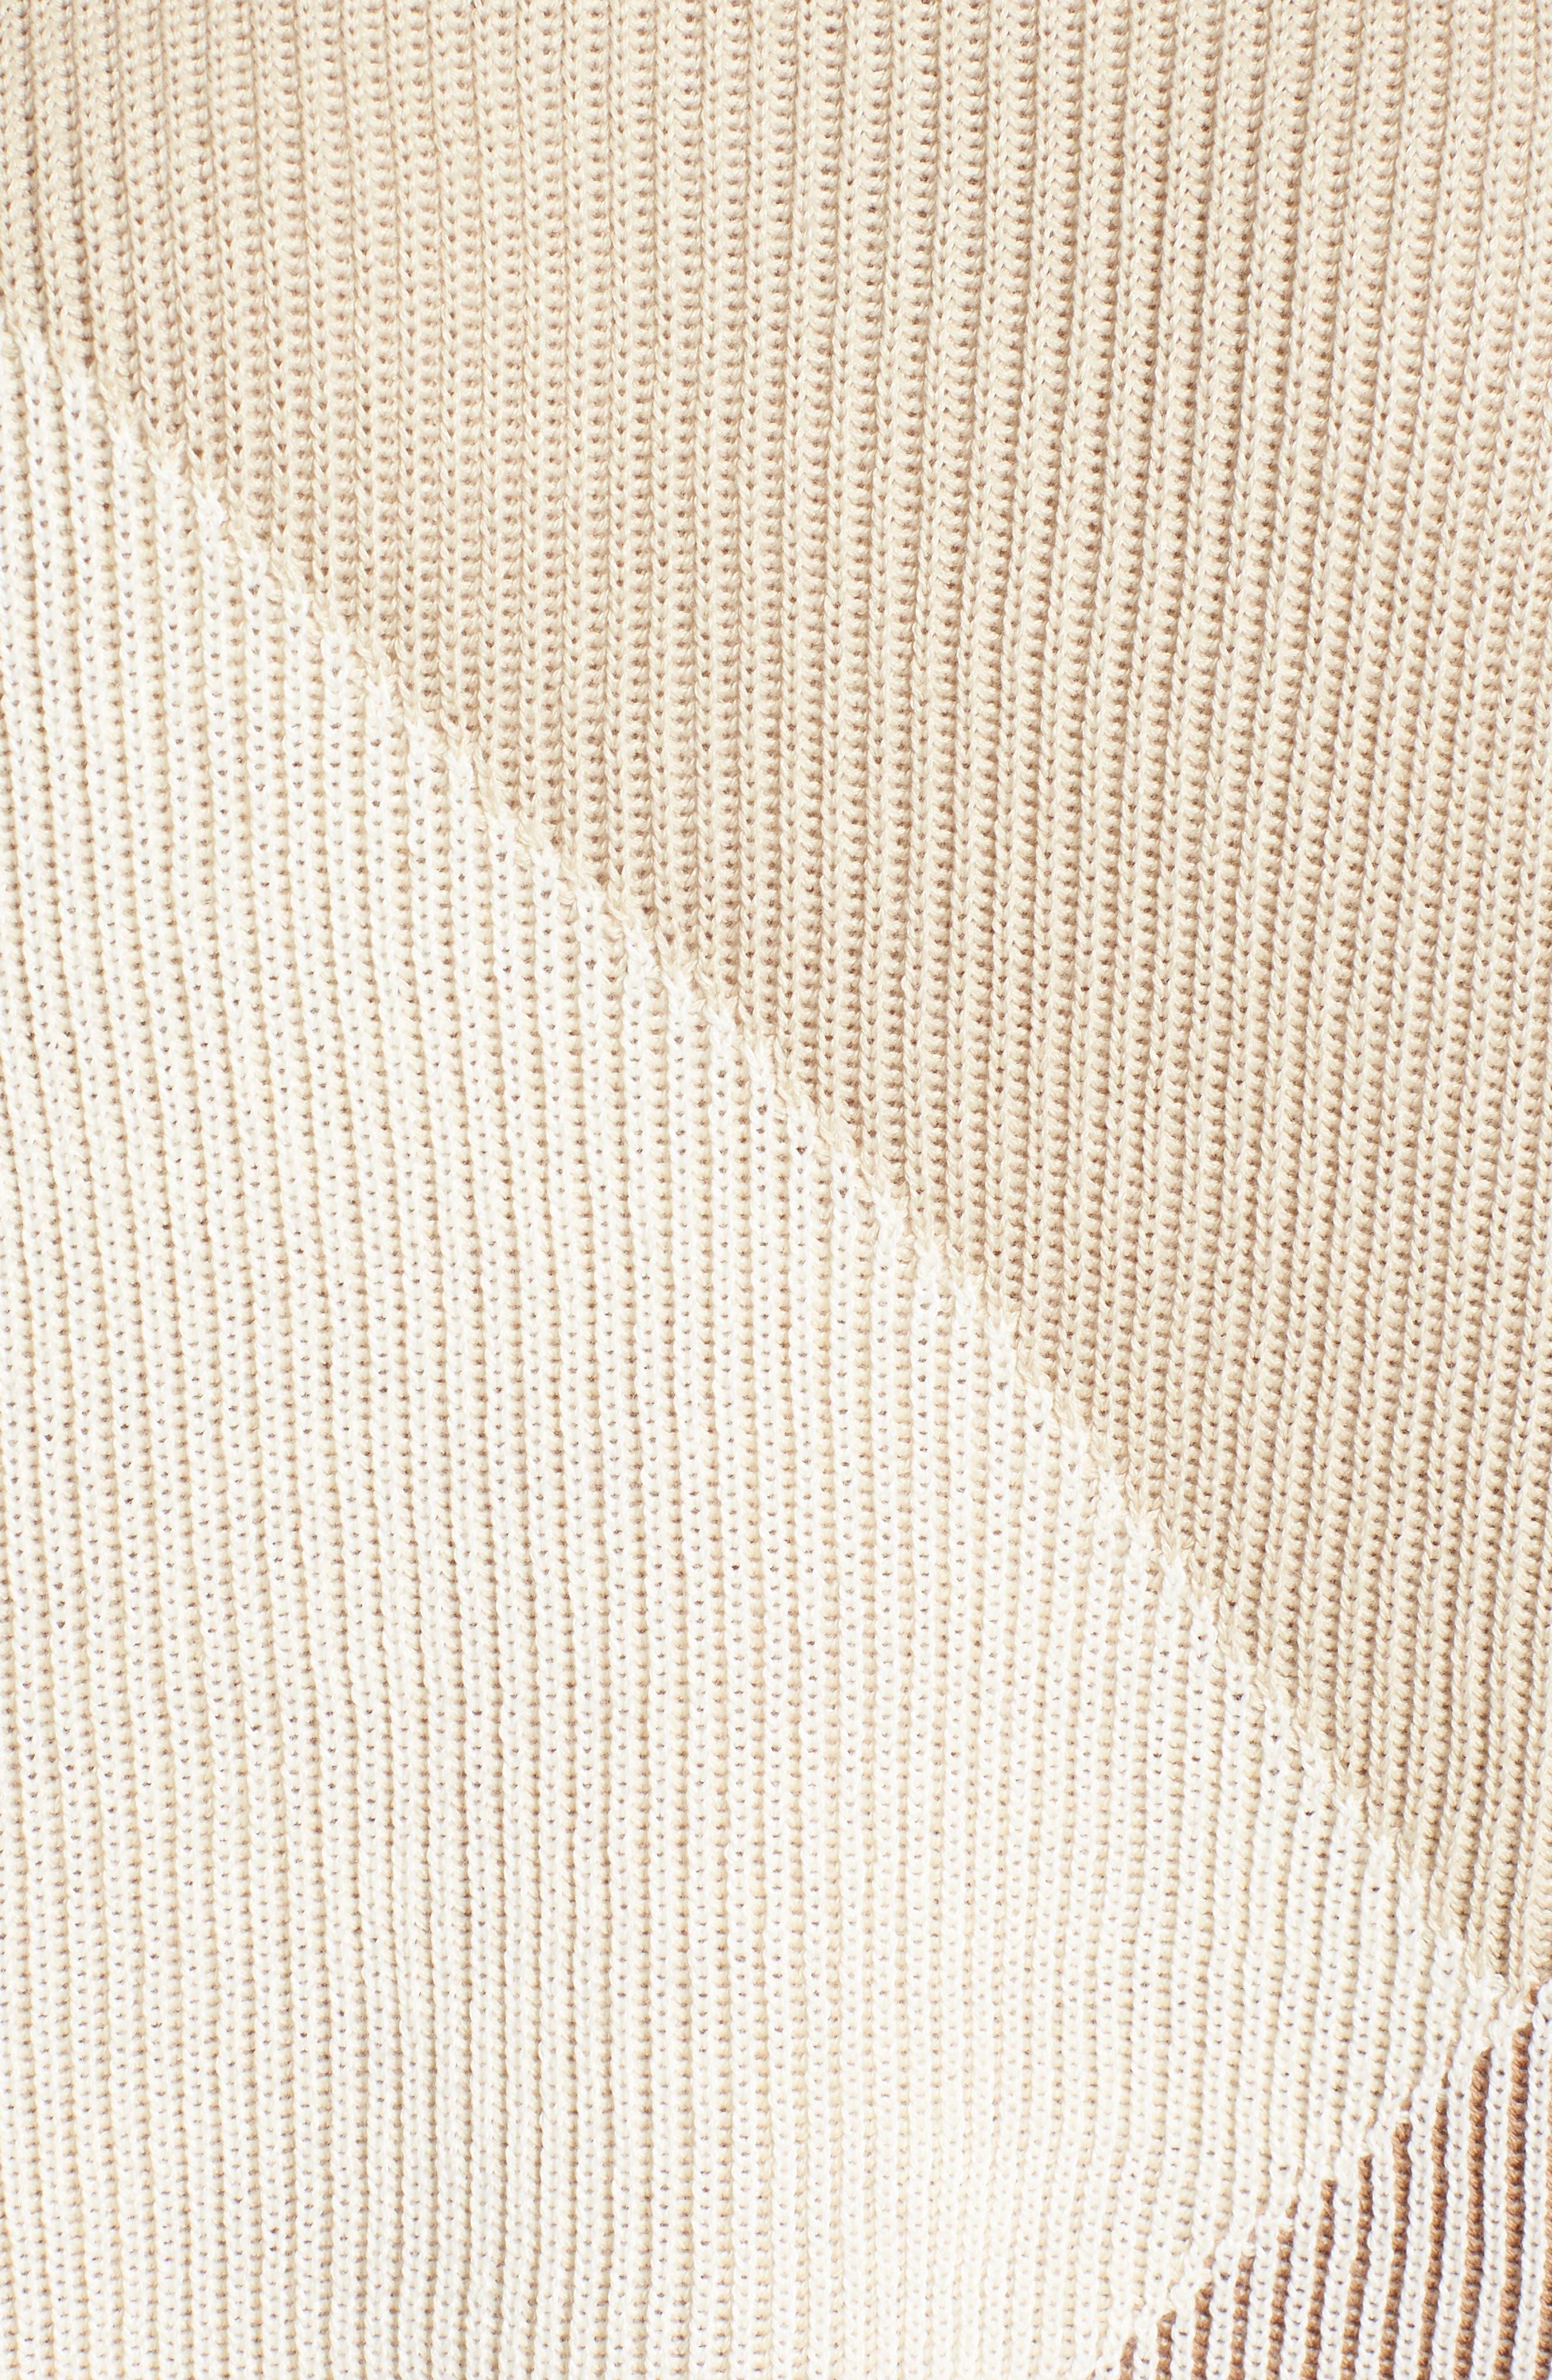 Linear Cozy Top,                             Alternate thumbnail 5, color,                             Beige Multi